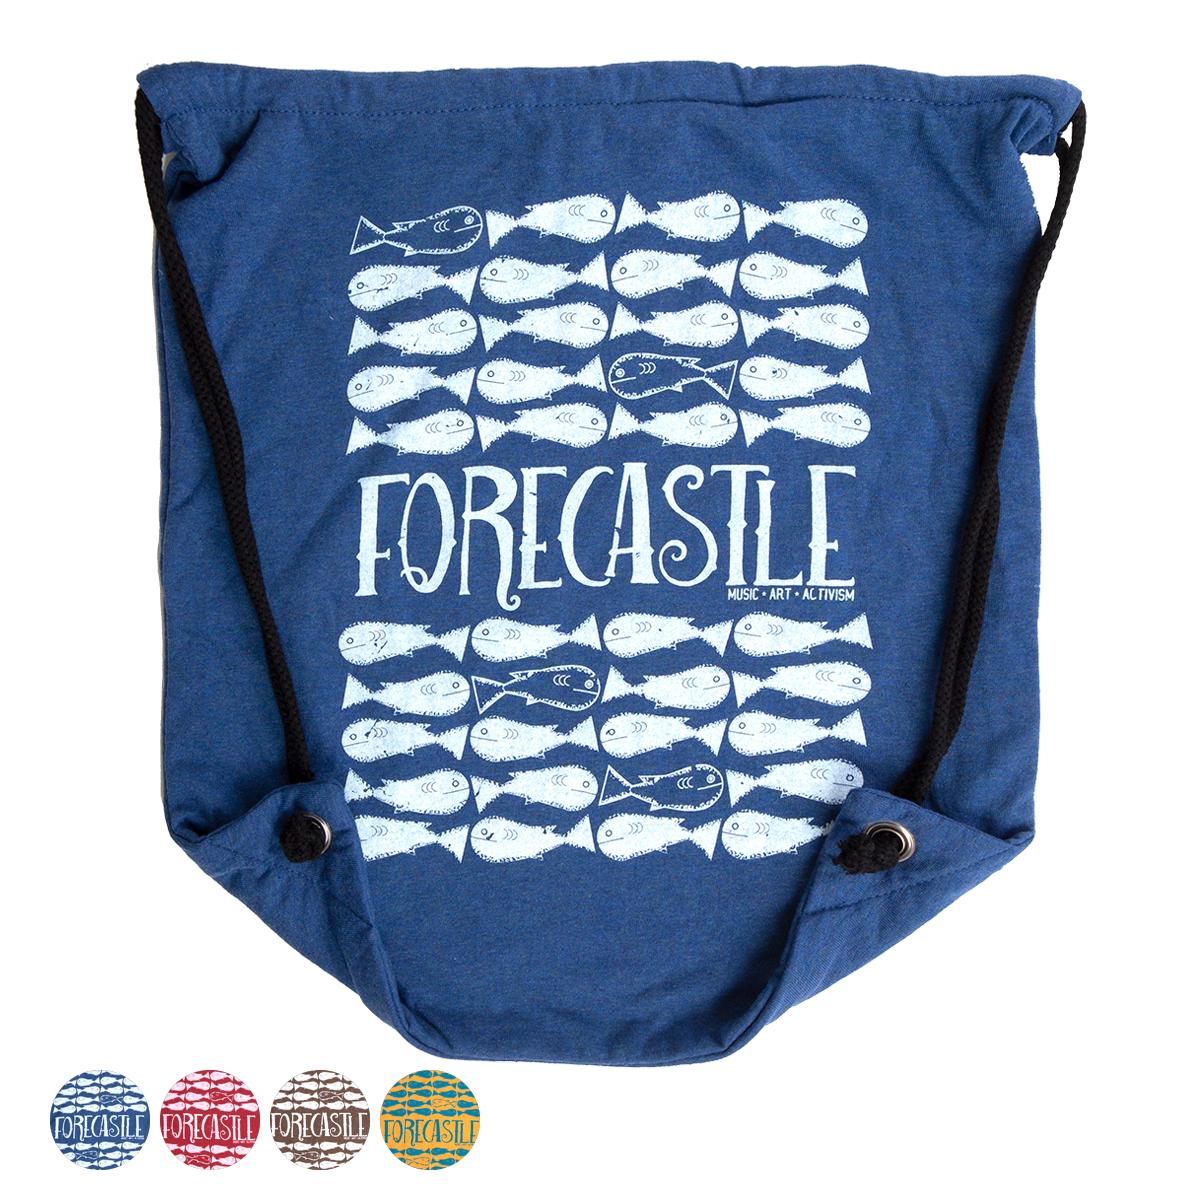 Forecastle Fish Drawstring Bag